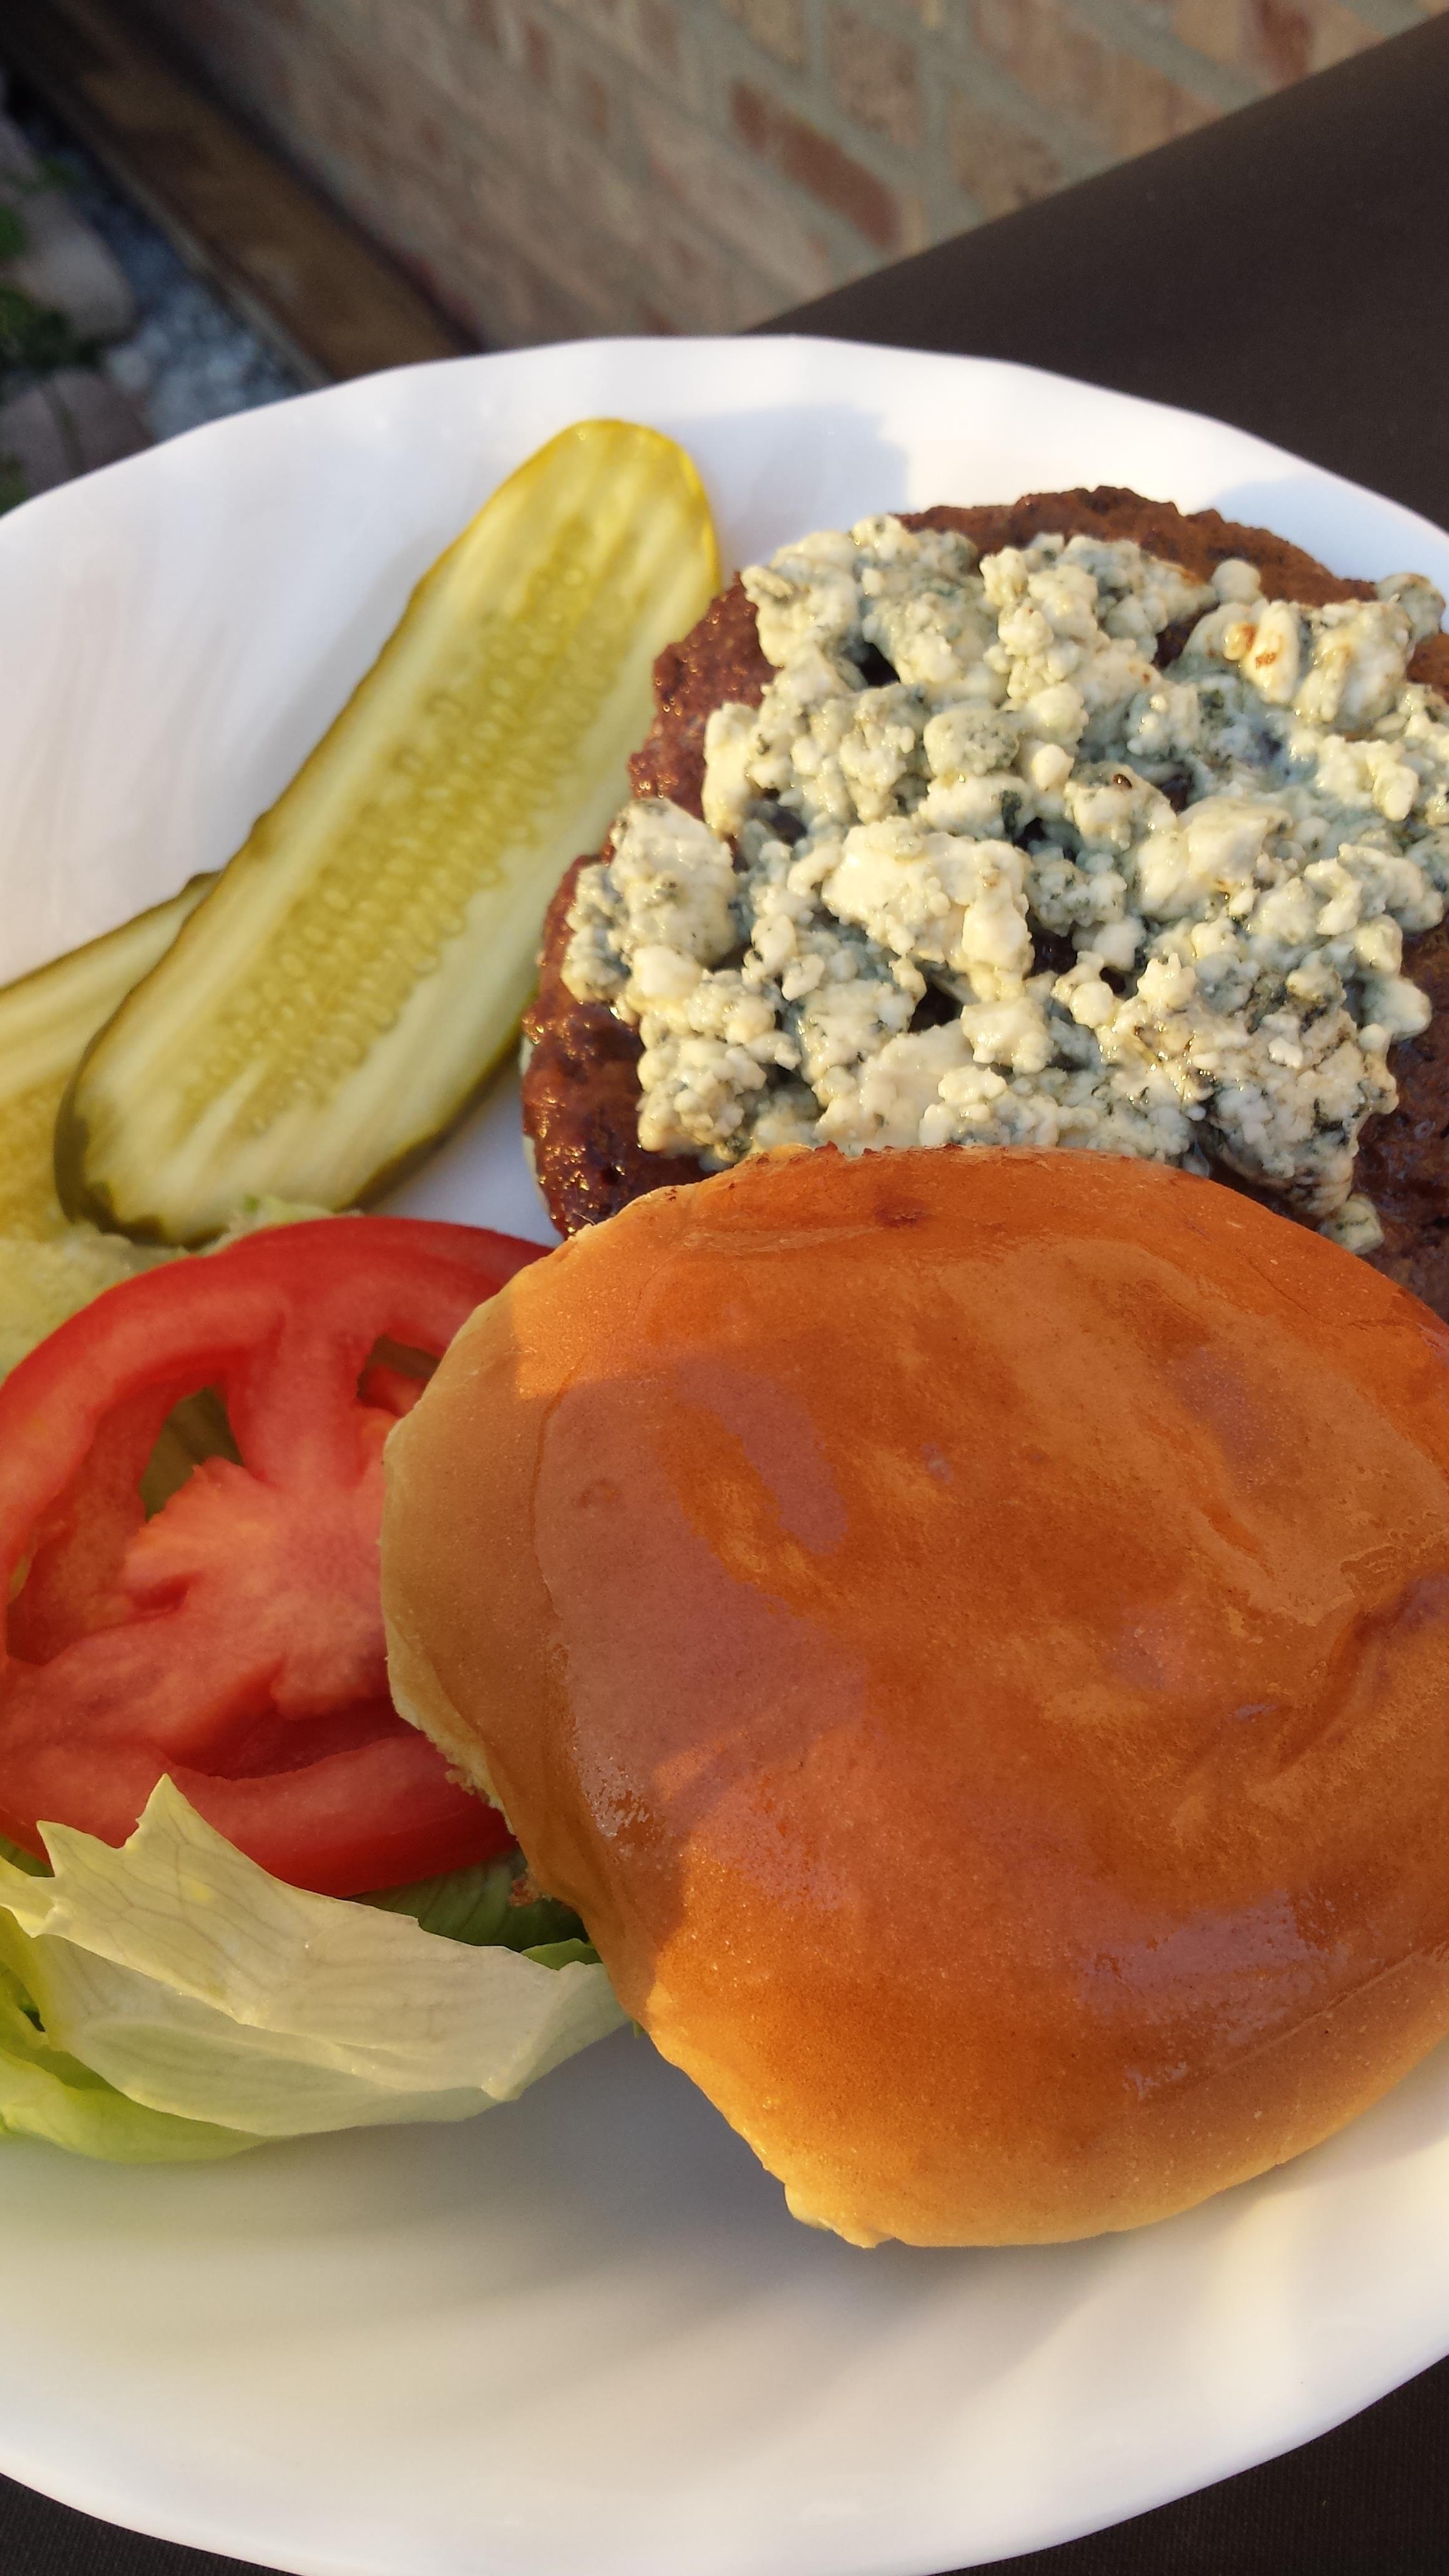 Zesty Black & Blue Burger Liz Dalton 'Lizzie'